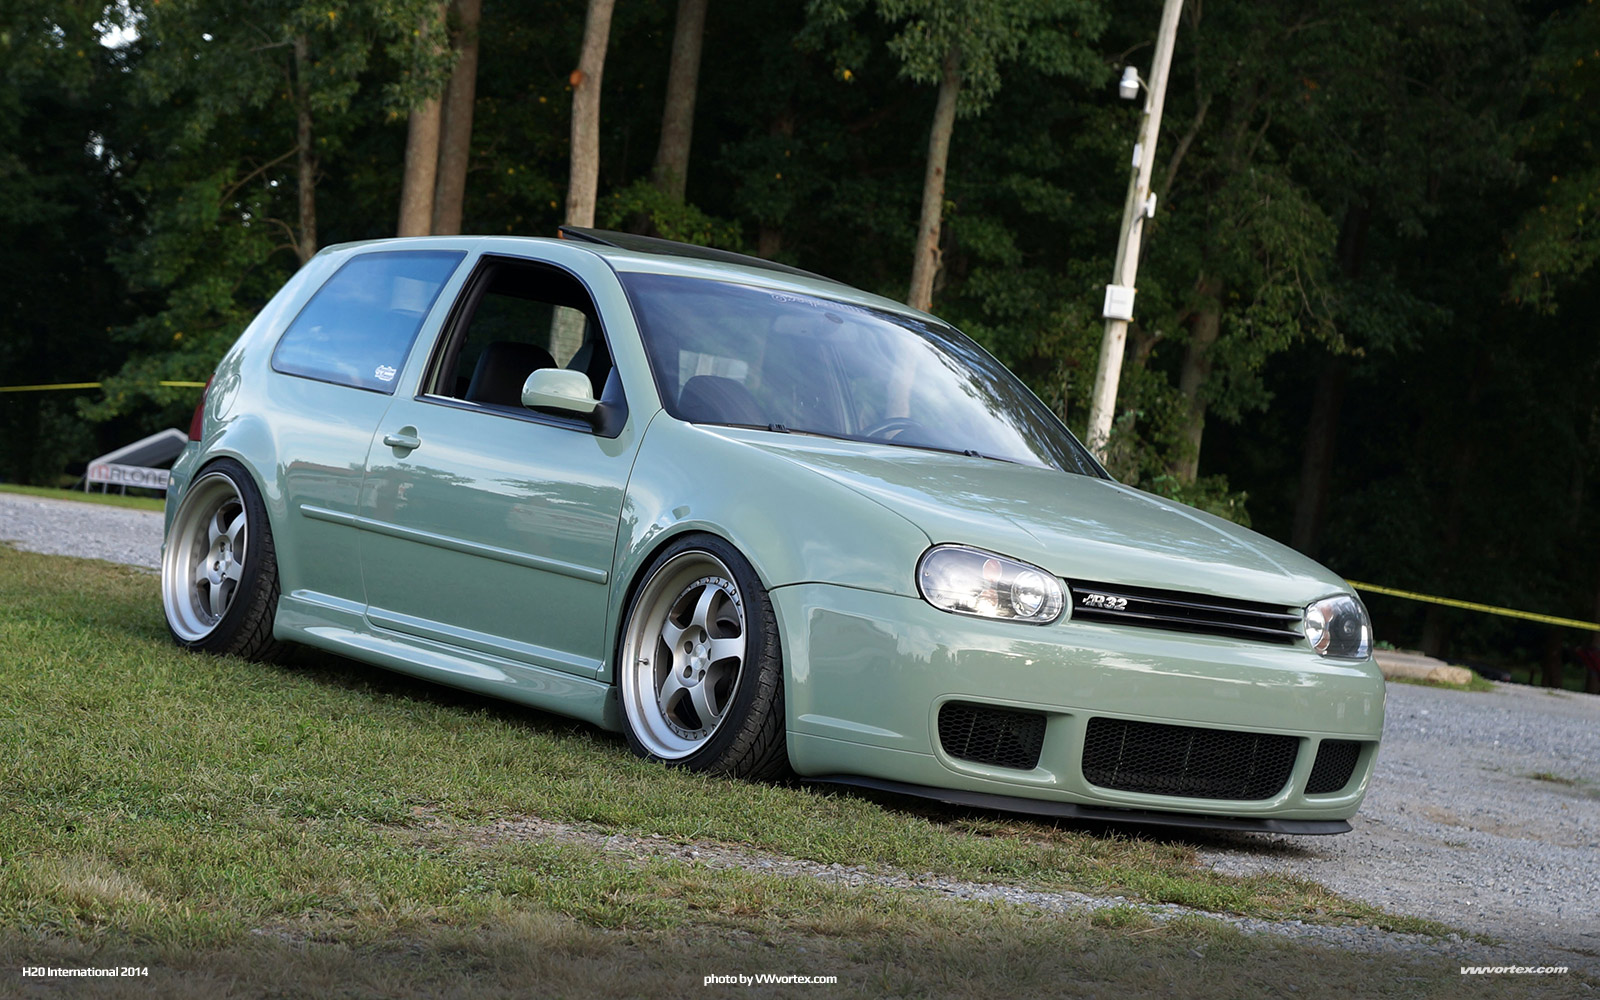 2014-H20i-H20-International-VW-Volkswagen-Audi-550